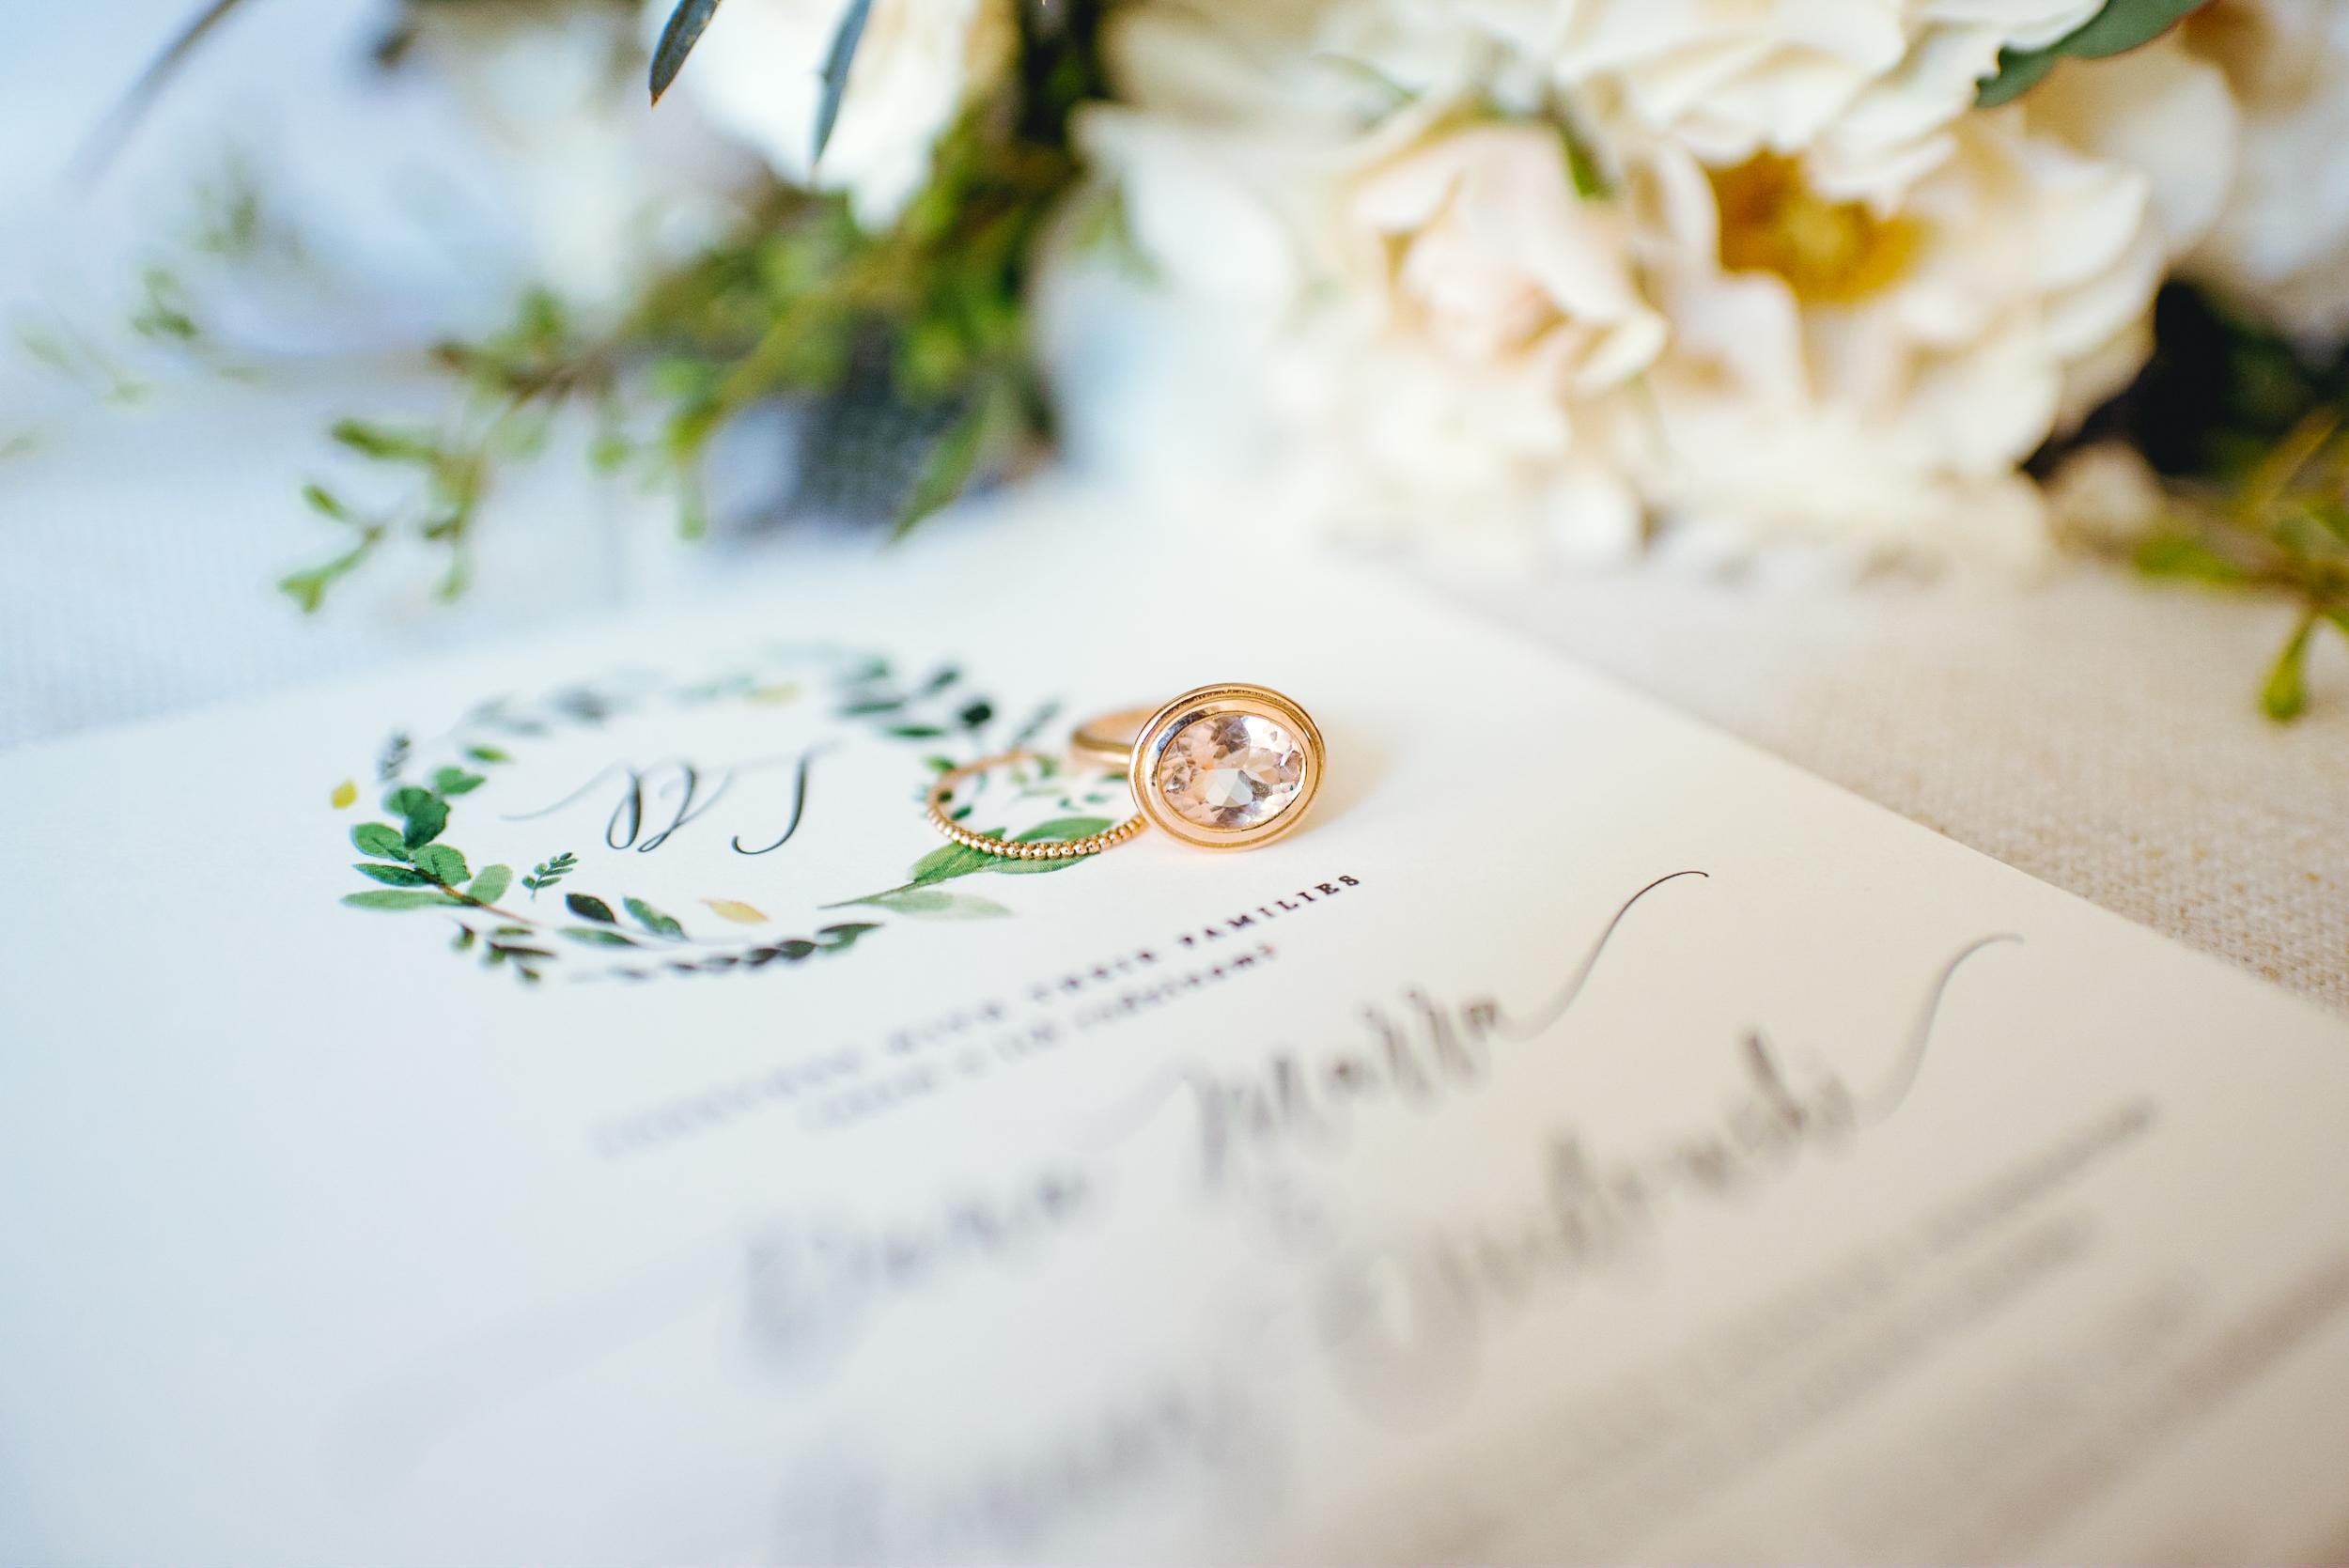 Hotel-du-village-wedding-winter-february-peaberry-photography-philadelphia-photographer-003.jpg